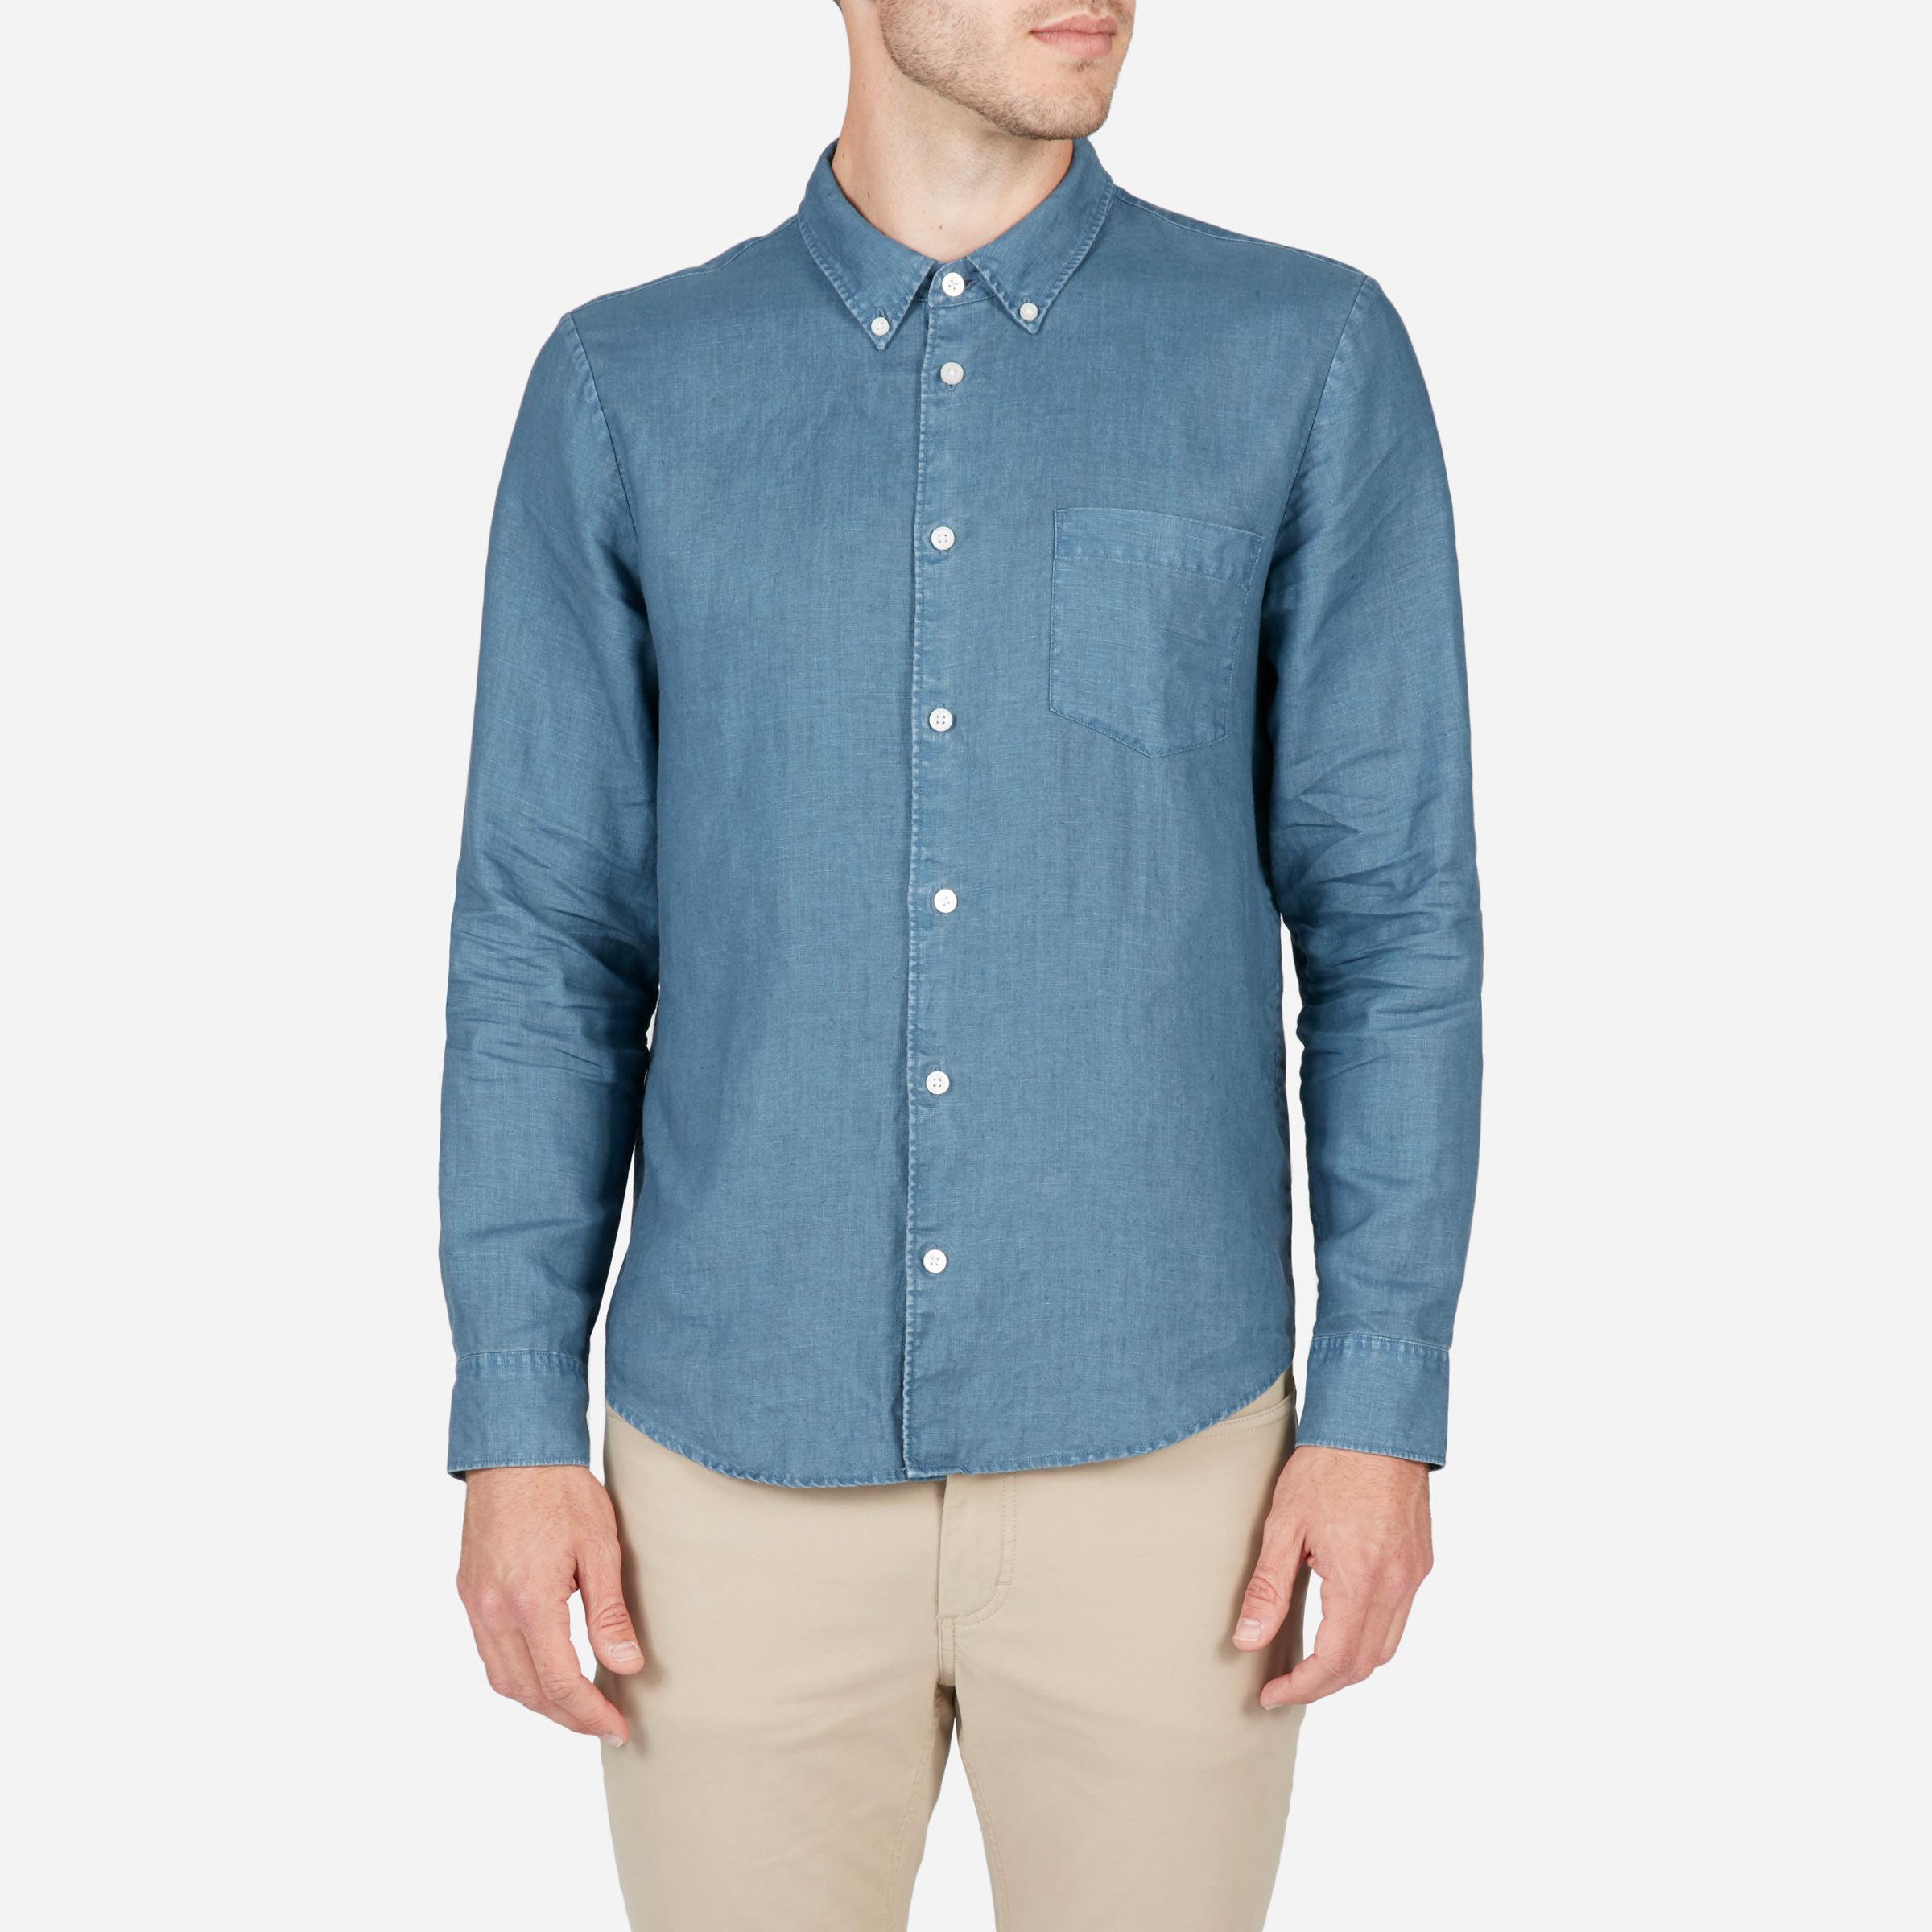 084f0f9a0e4671 Men's Linen Slim Fit Shirt   Everlane